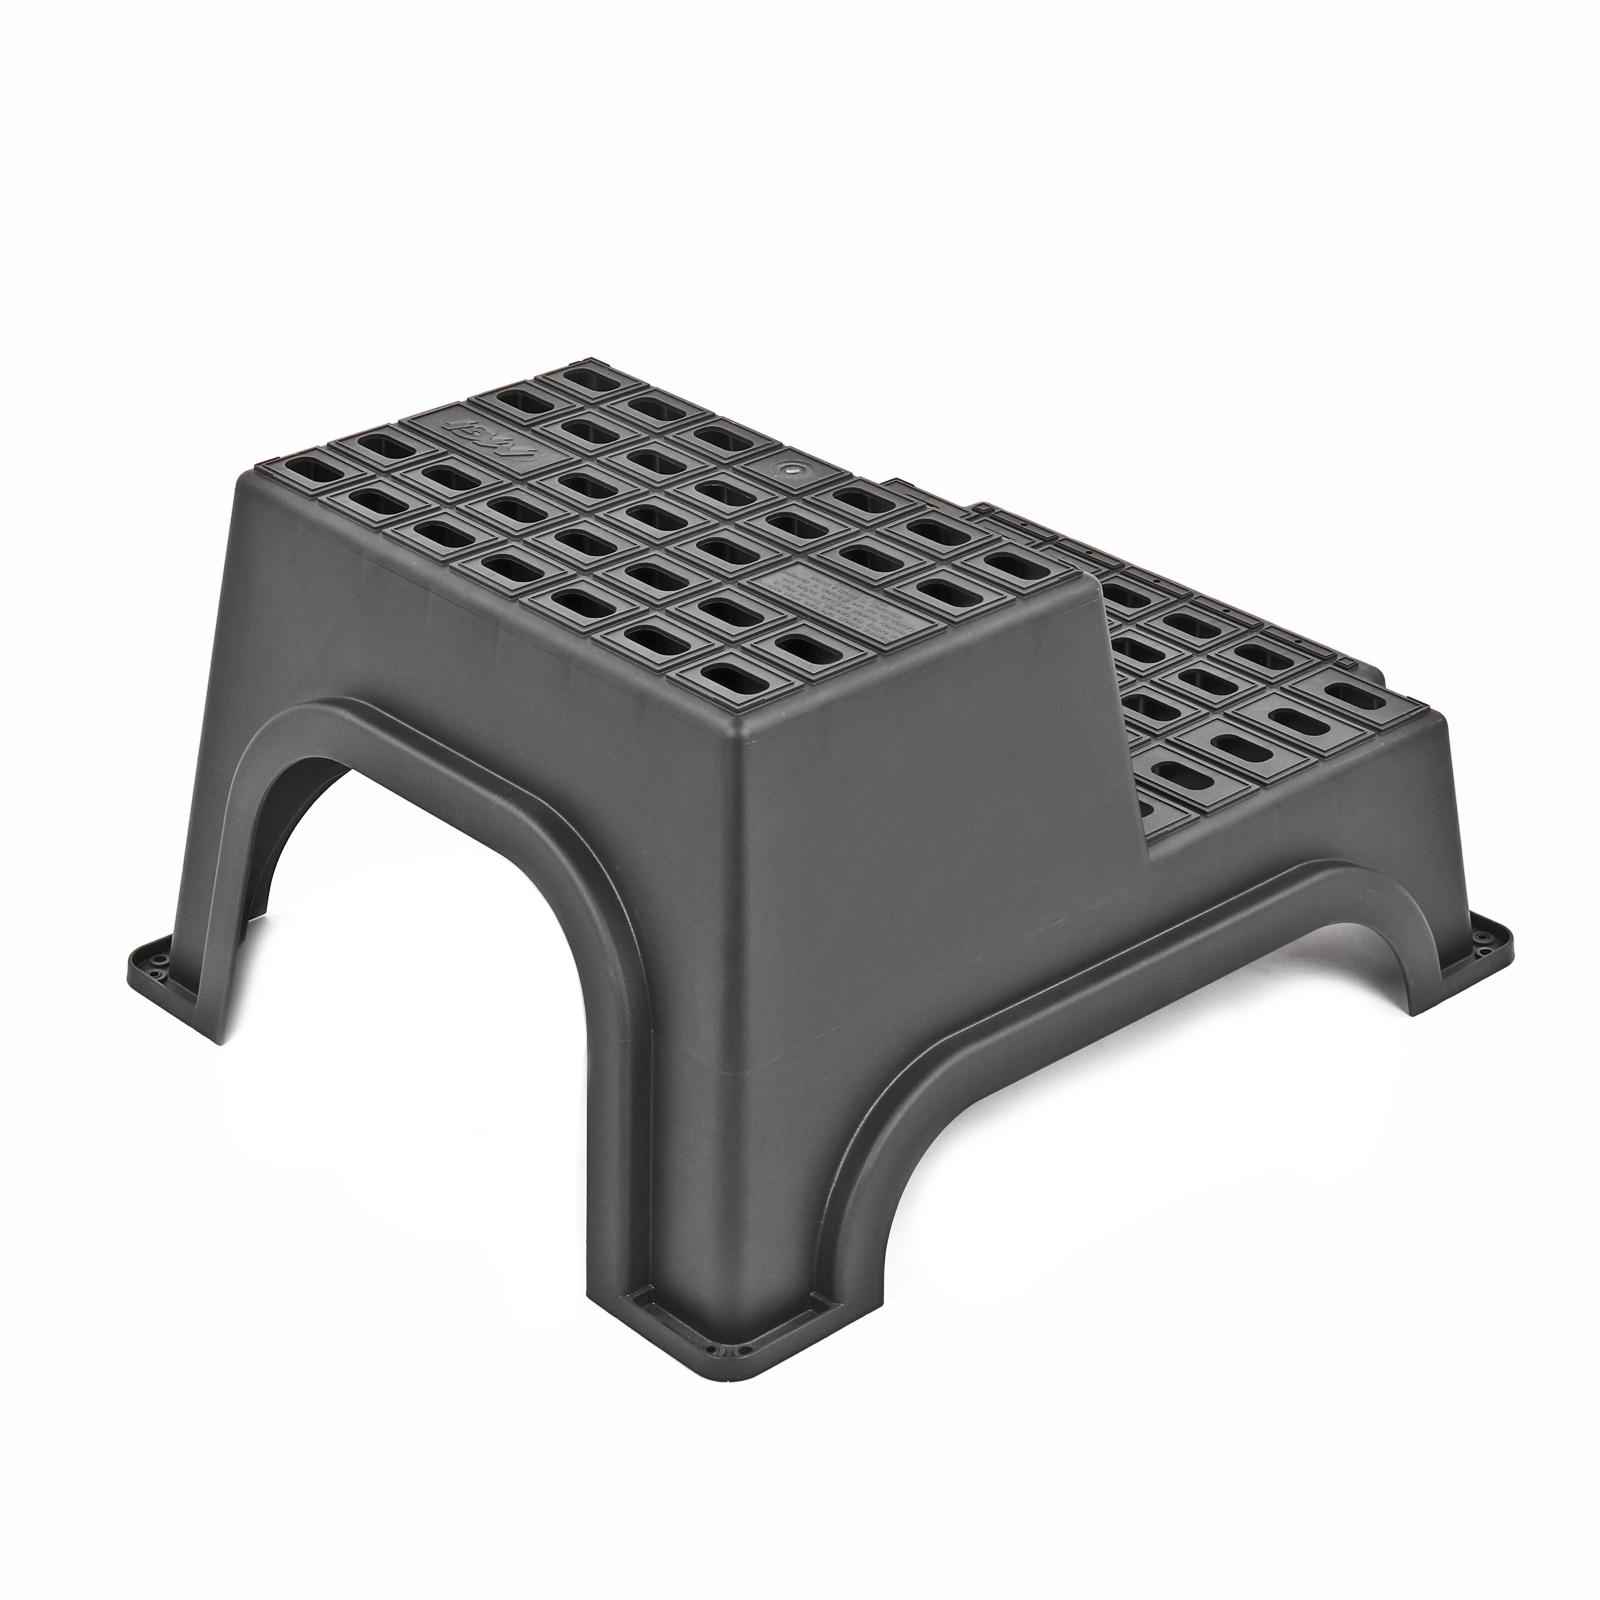 mgi milenco giant double step doppeltrittstufe xxl inkl kunststoff heringe ebay. Black Bedroom Furniture Sets. Home Design Ideas